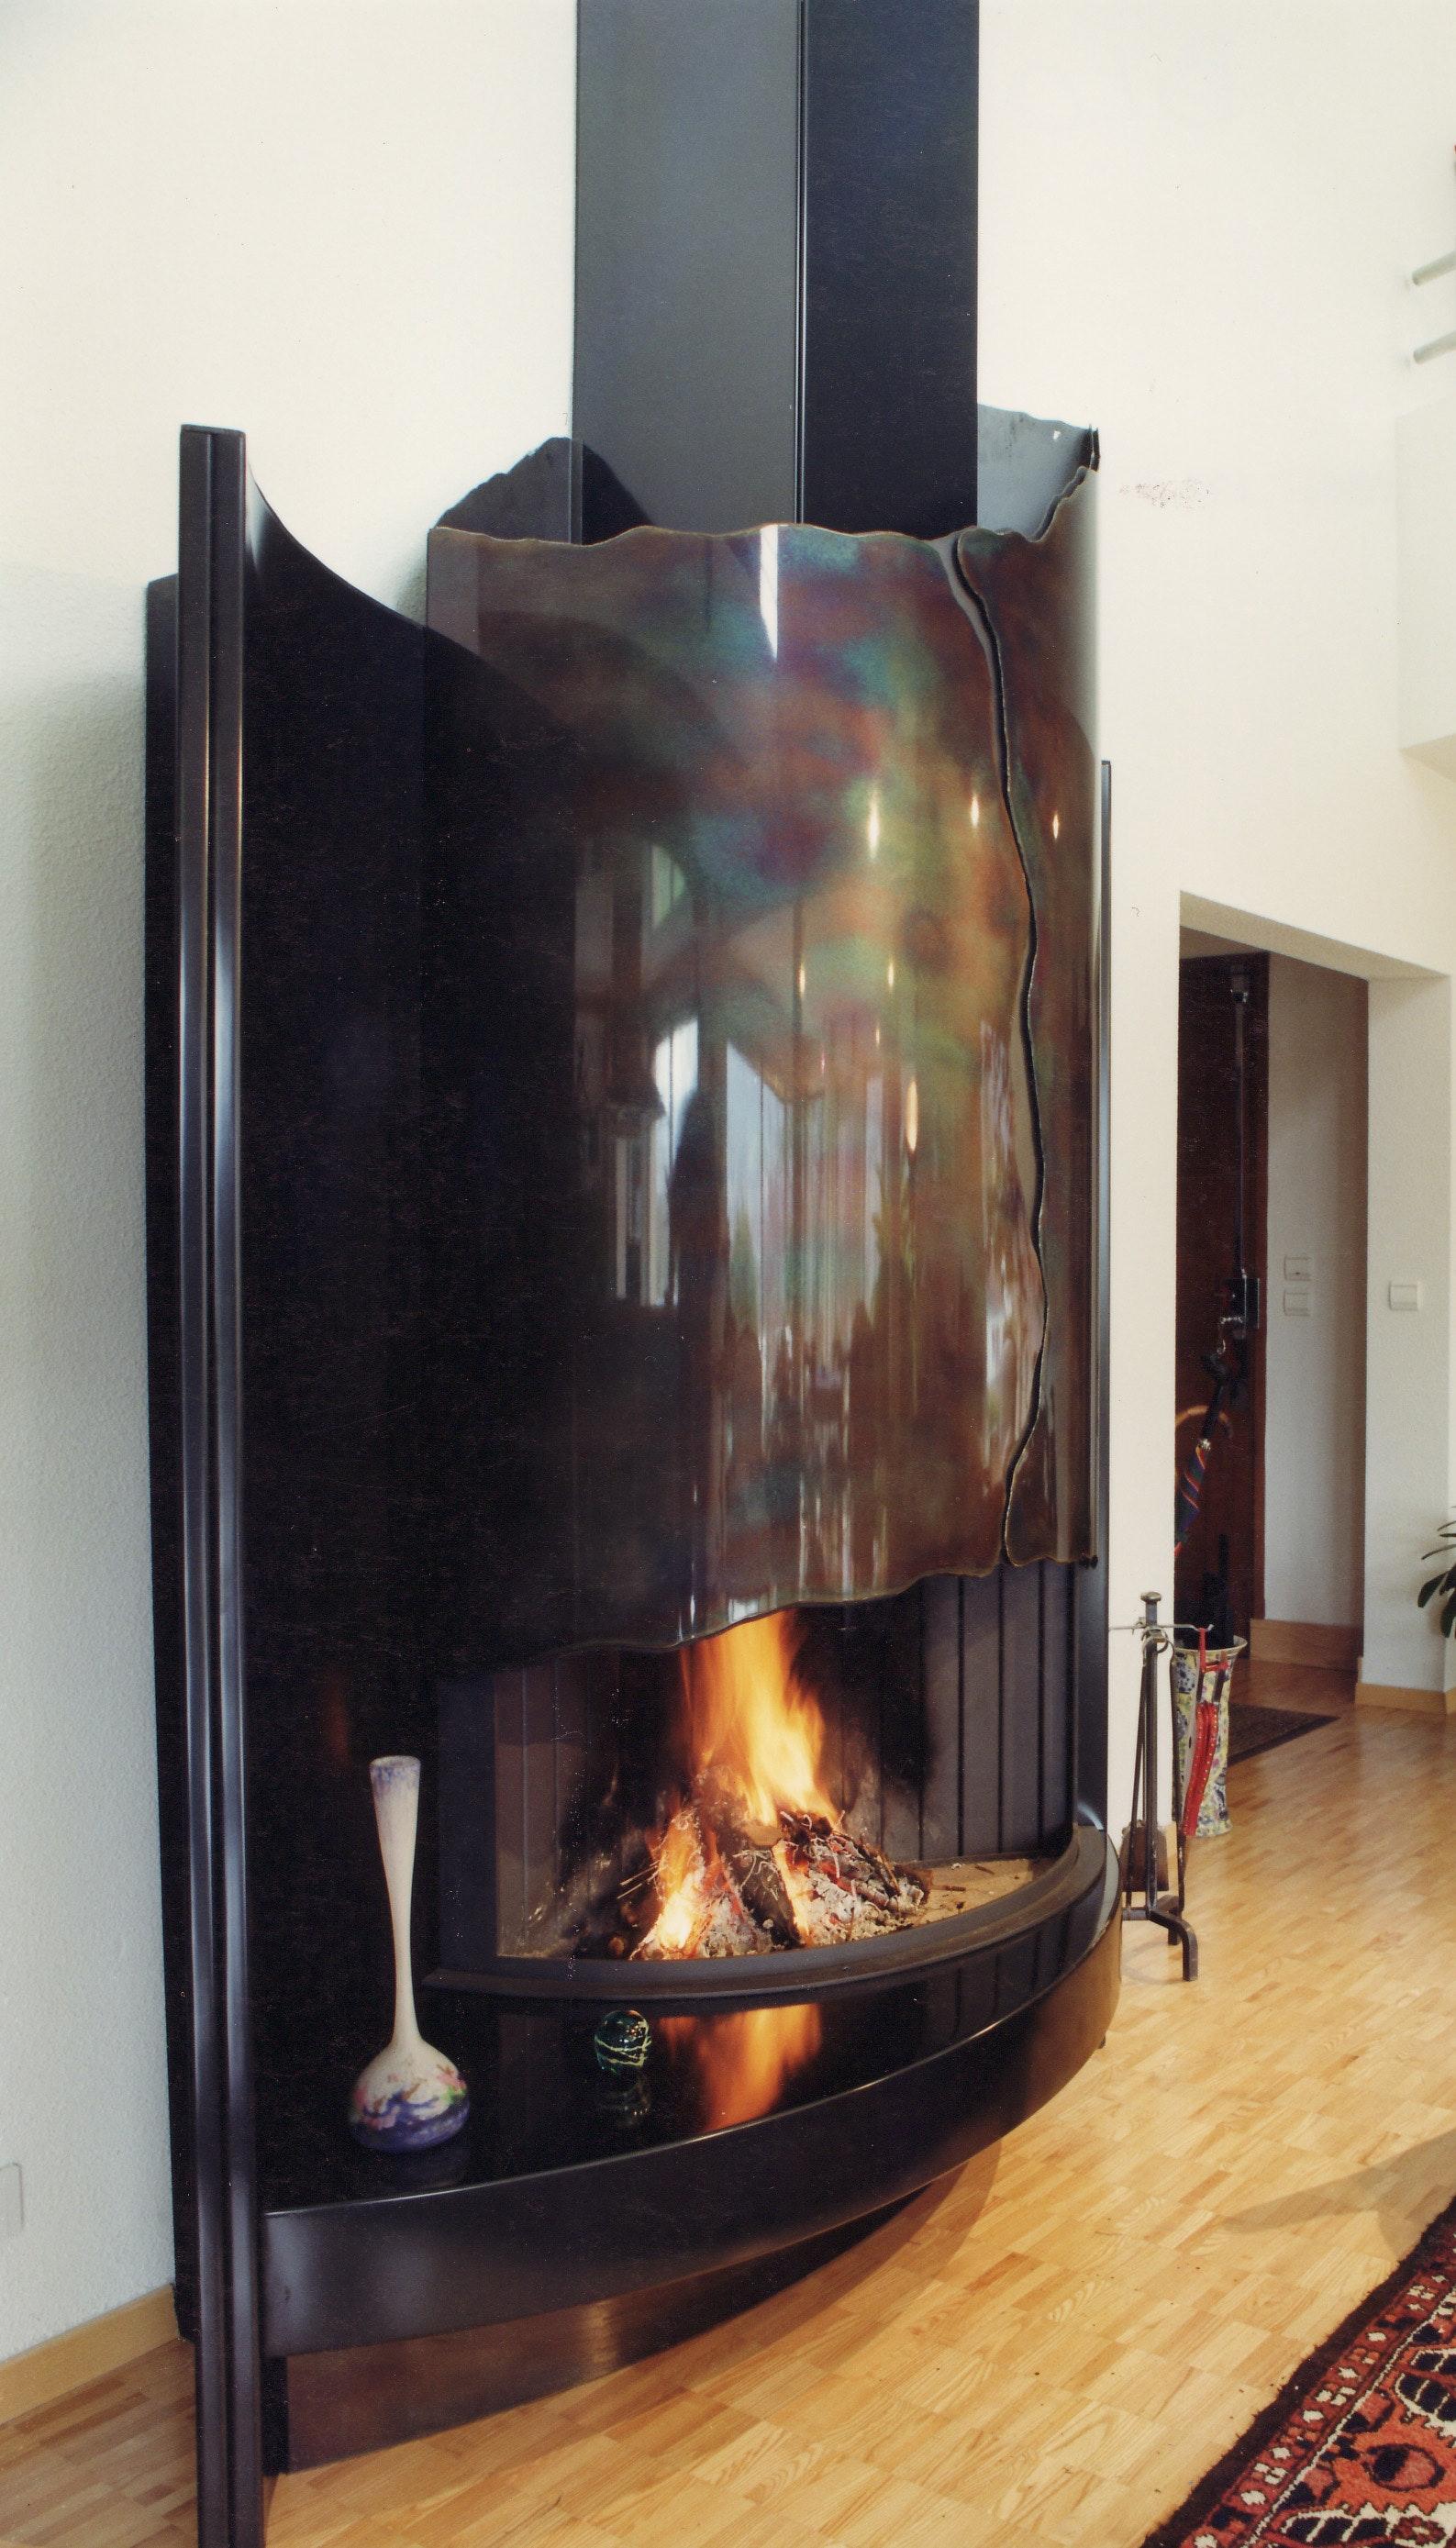 Bloch Design contemporary fireplace 1 Bespoke fireplace